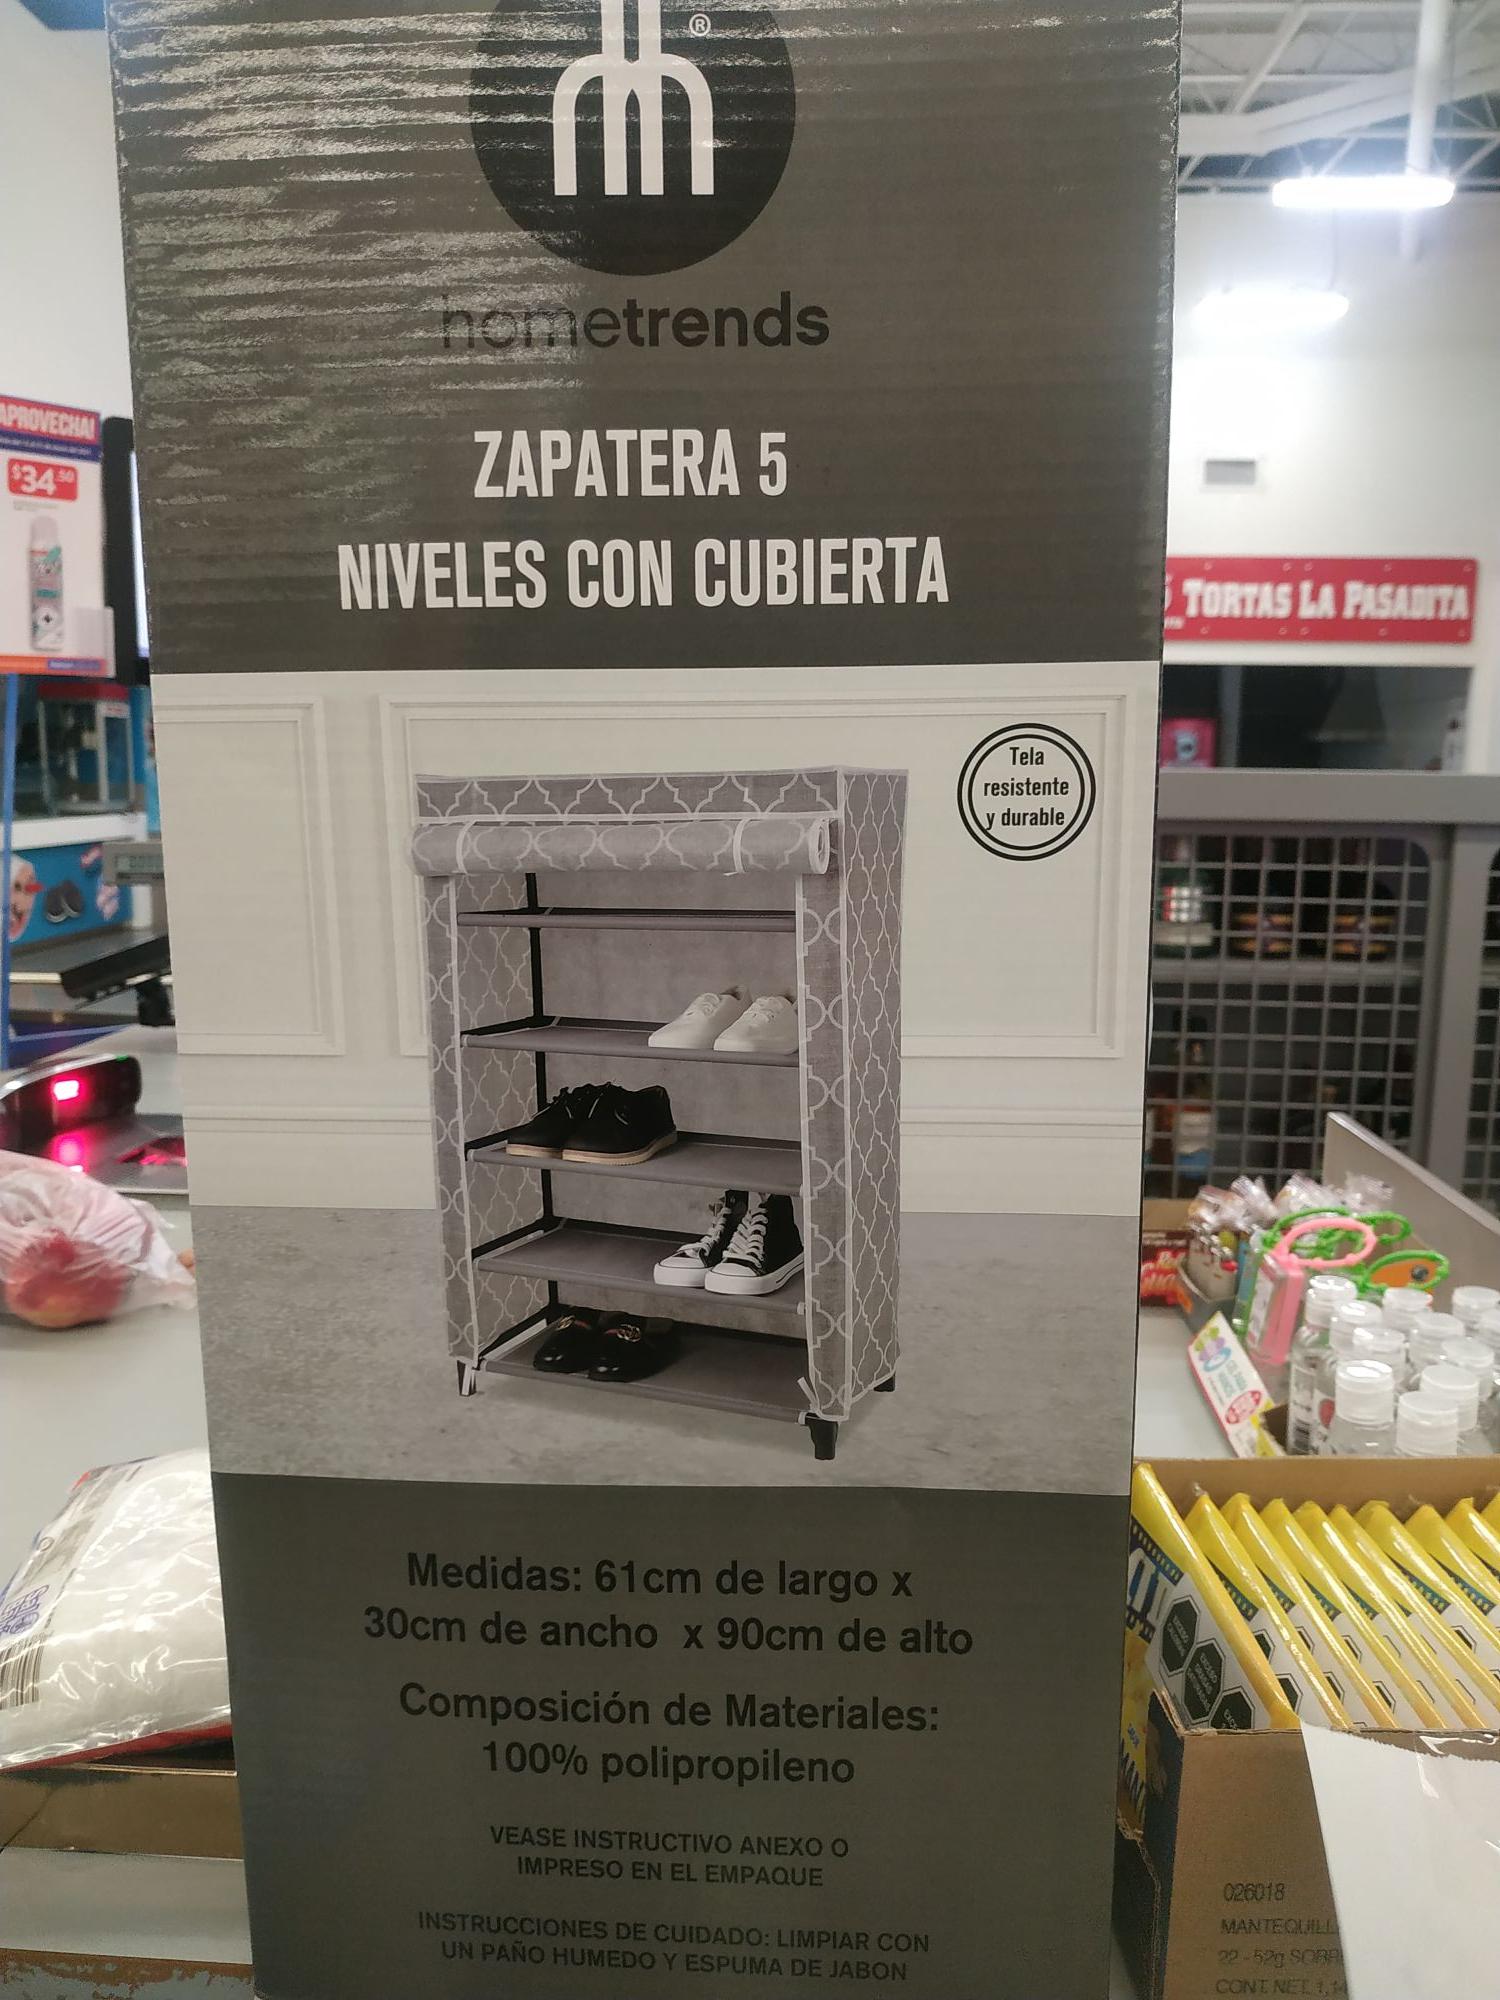 Walmart: Zapatera 5 niveles